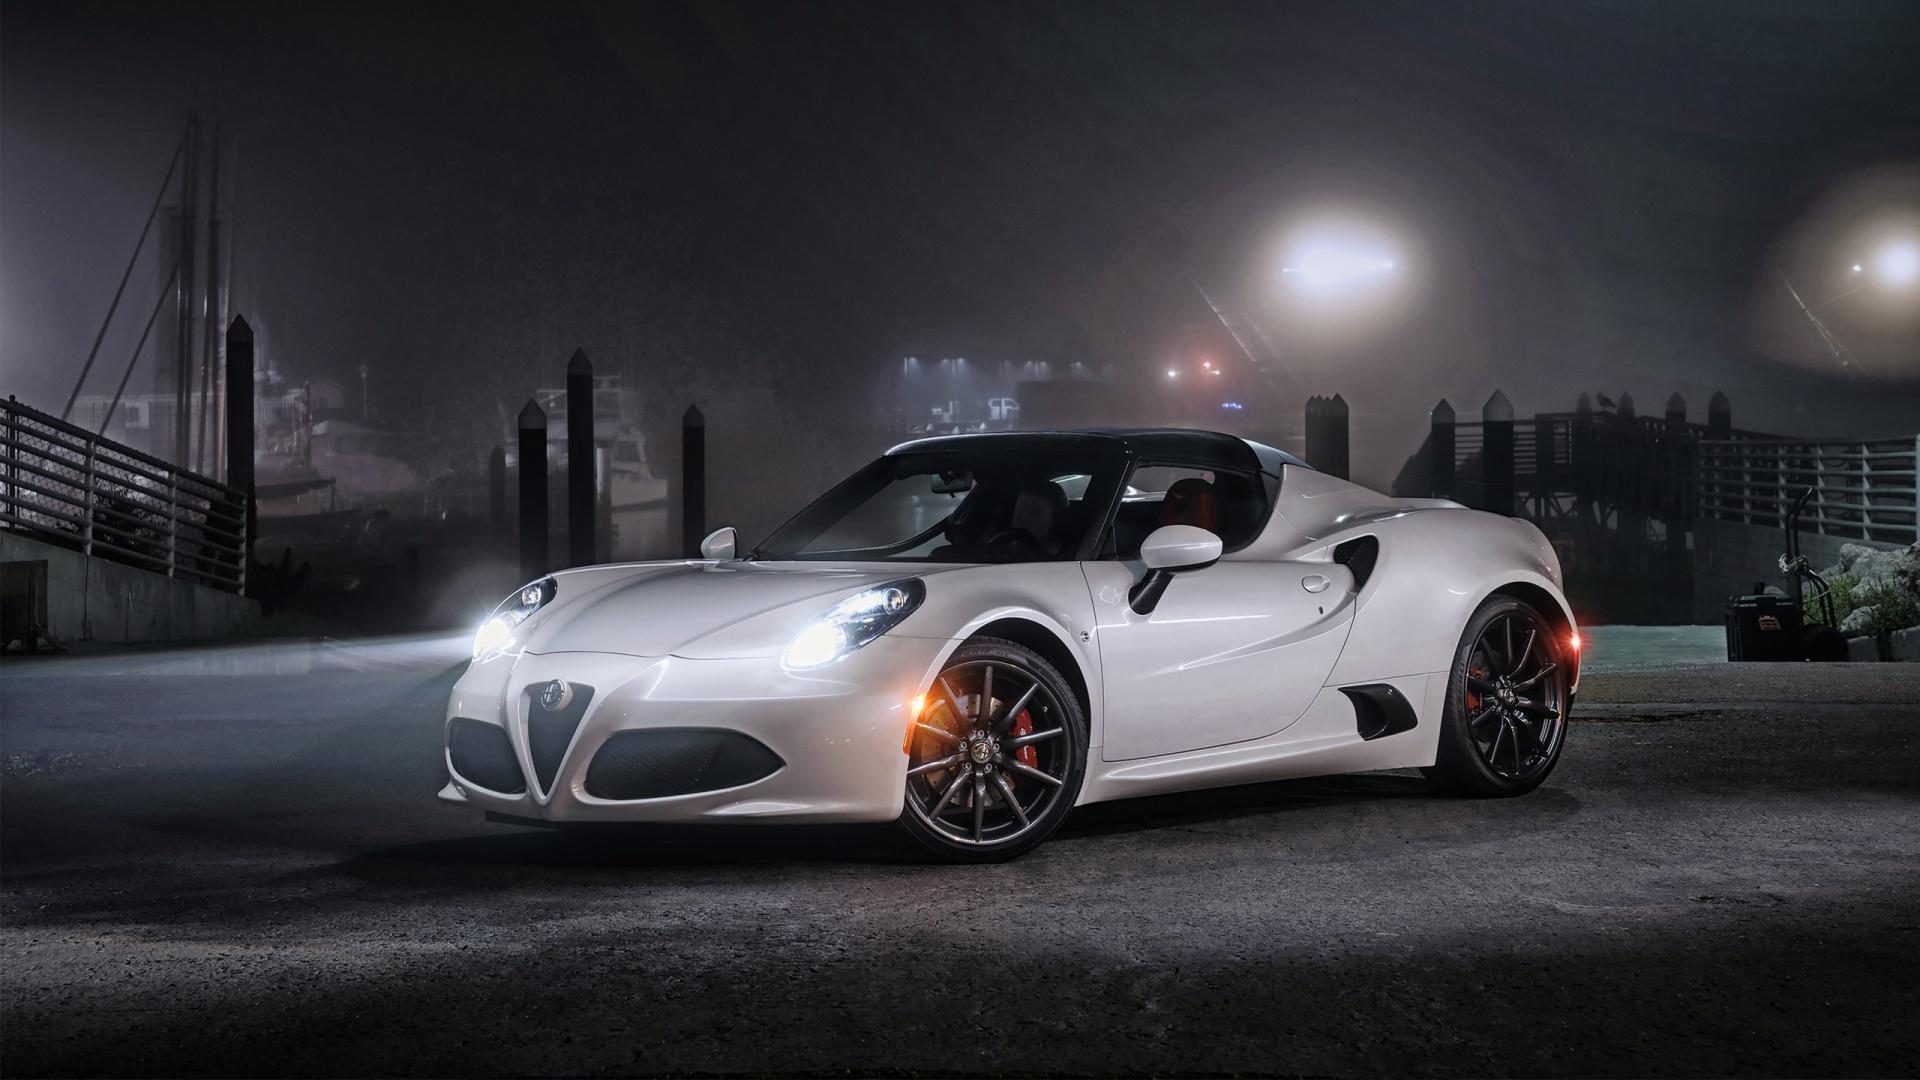 Alfa Romeo 4c 2015 Spider Hd Desktop Wallpapers 4k Hd